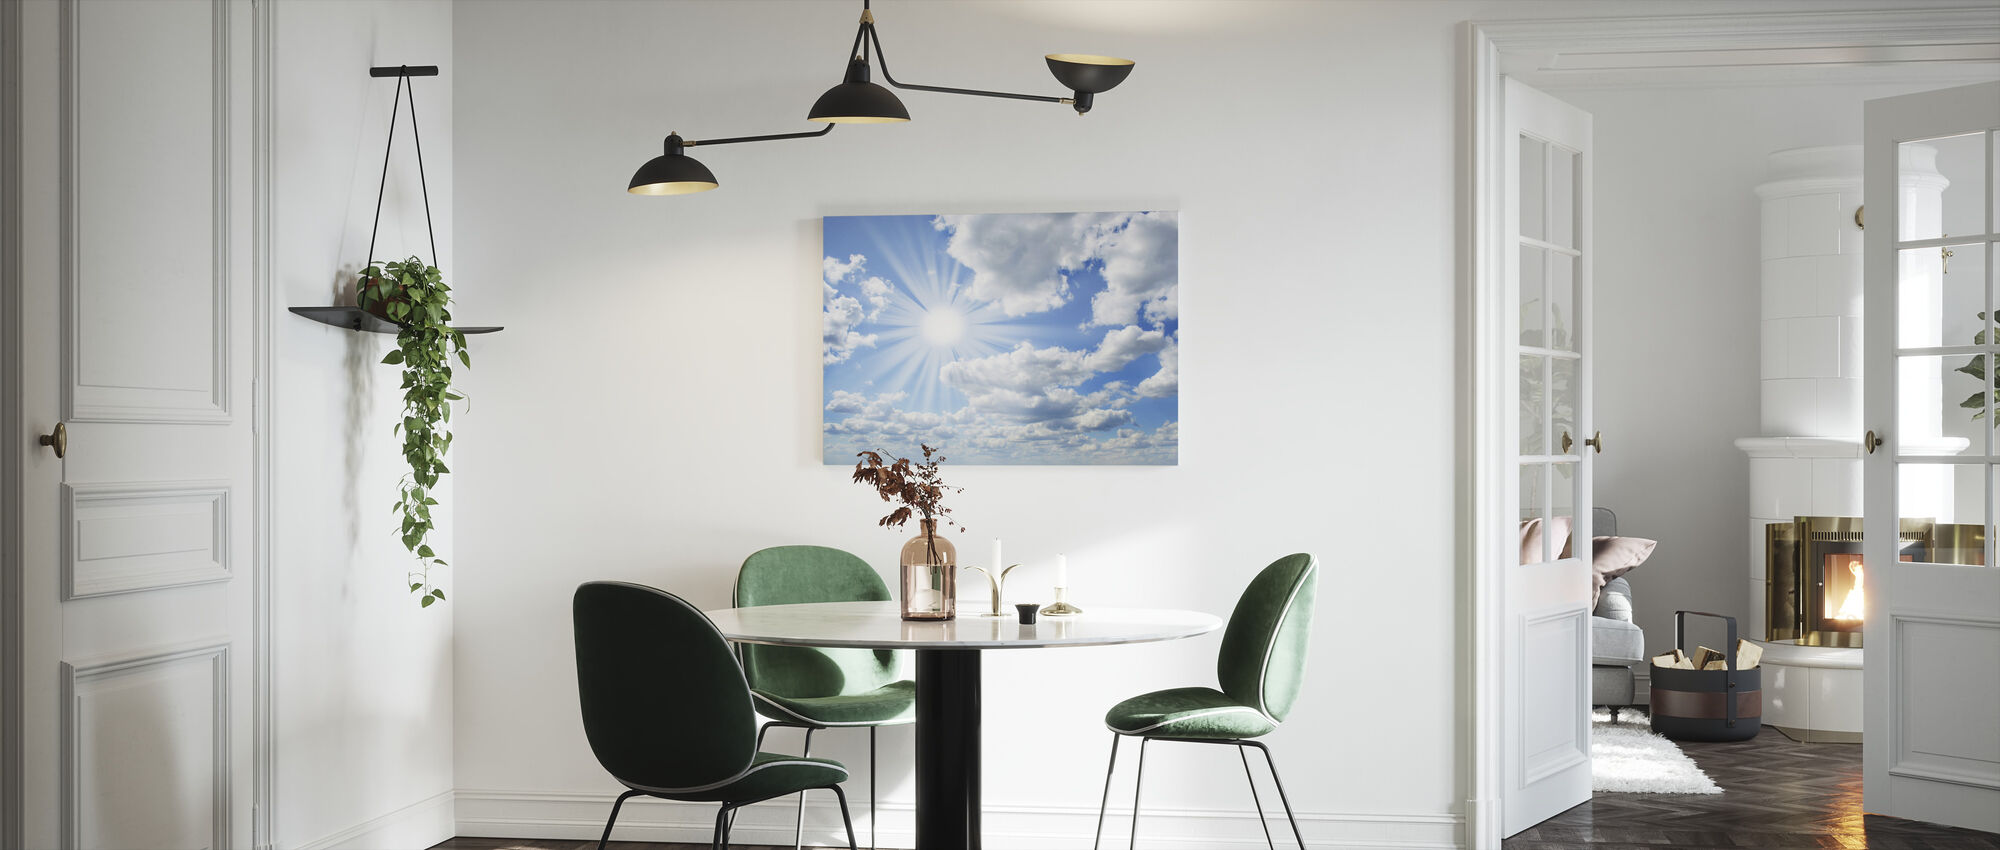 Zonnige dag - Canvas print - Keuken